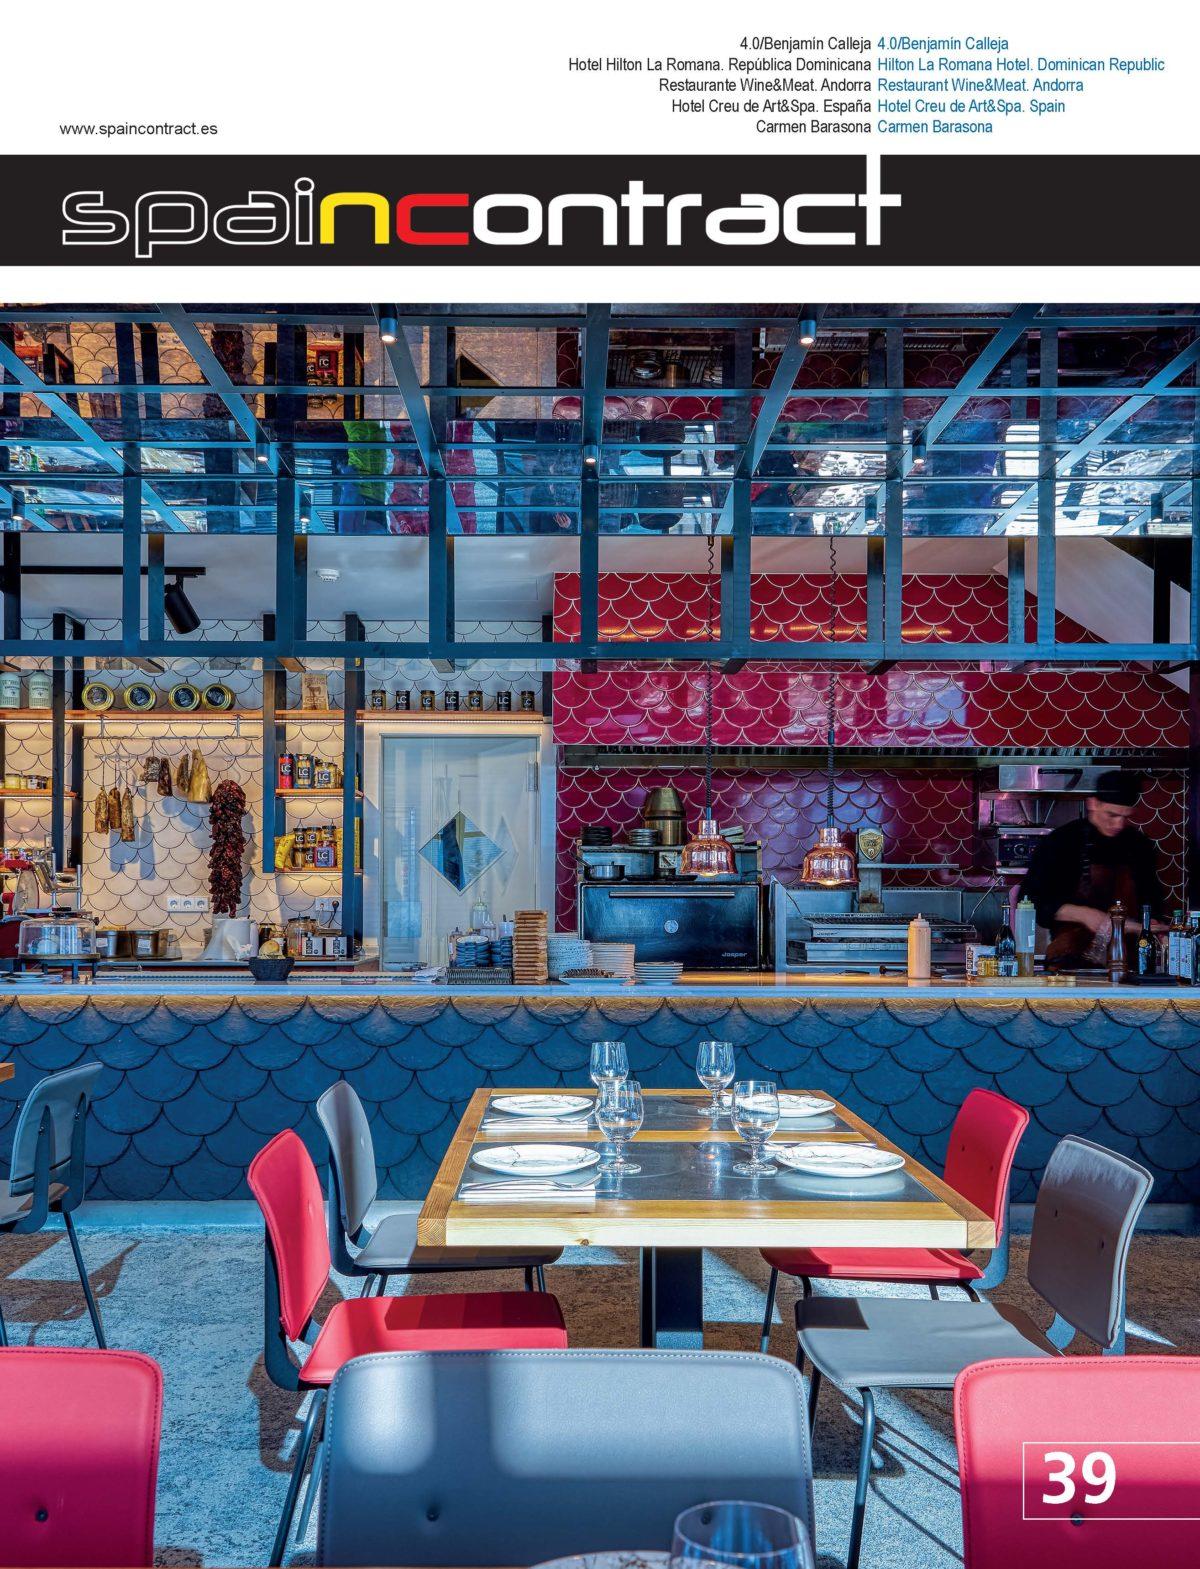 Spain contract interiorismo restaurante Grandvalira por Rosa Colet Design